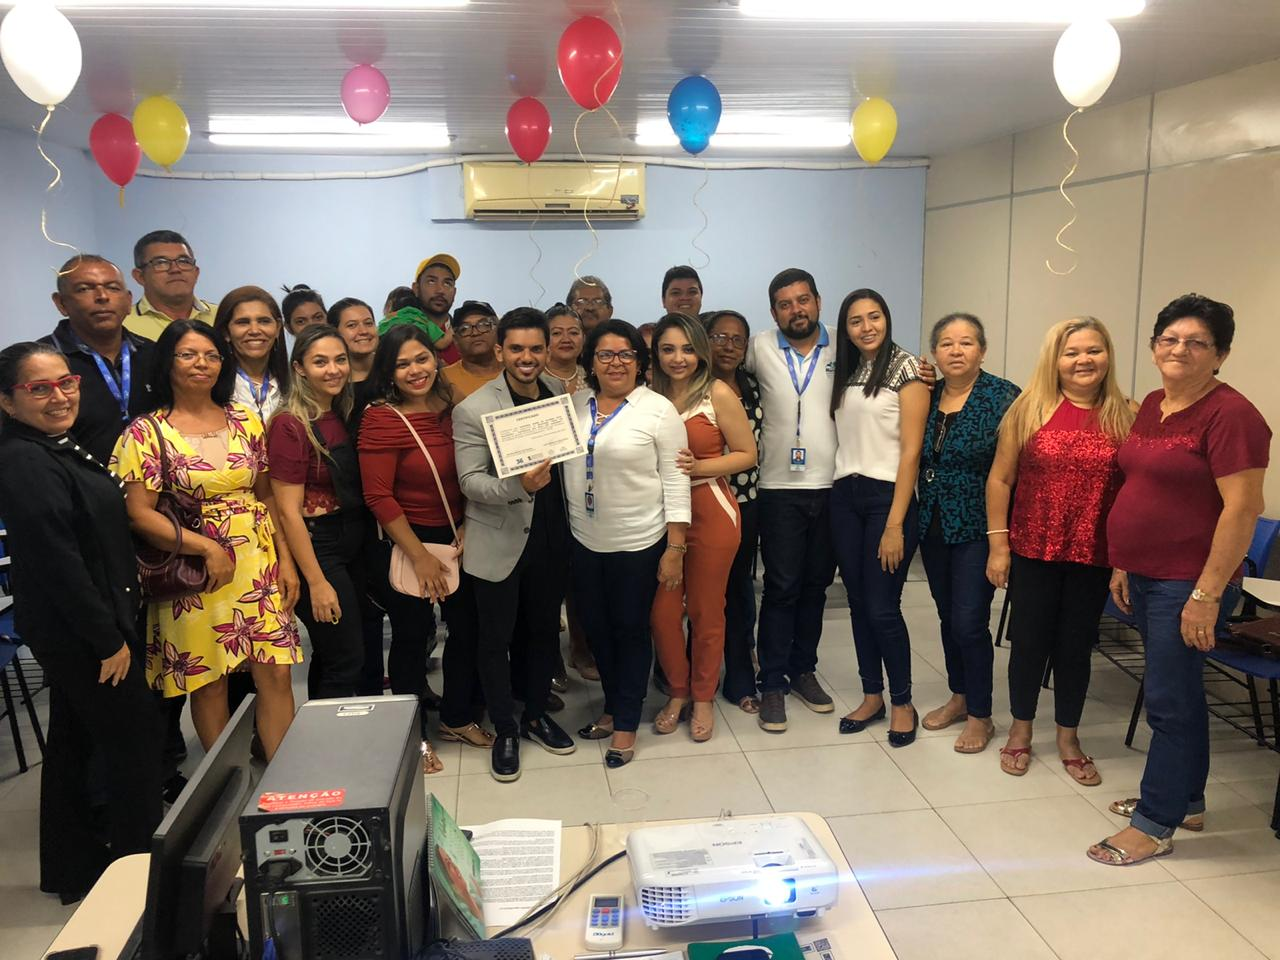 Feira Popular realizou workshop sobre Empreendedorismo